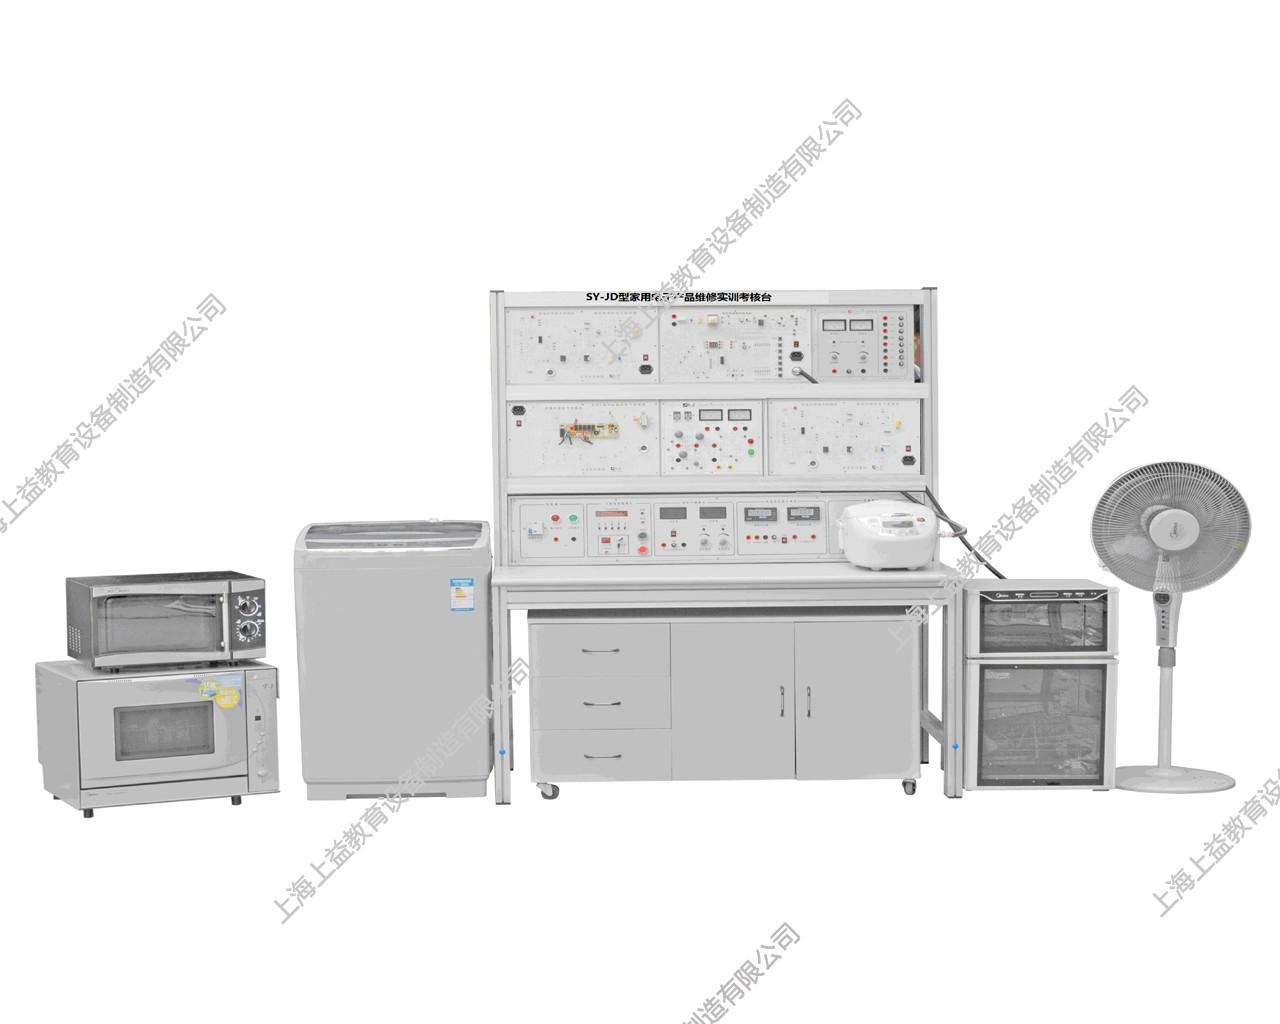 SY-JD型 家用电子产品电器维修wwwlehu8viplehu68vip台